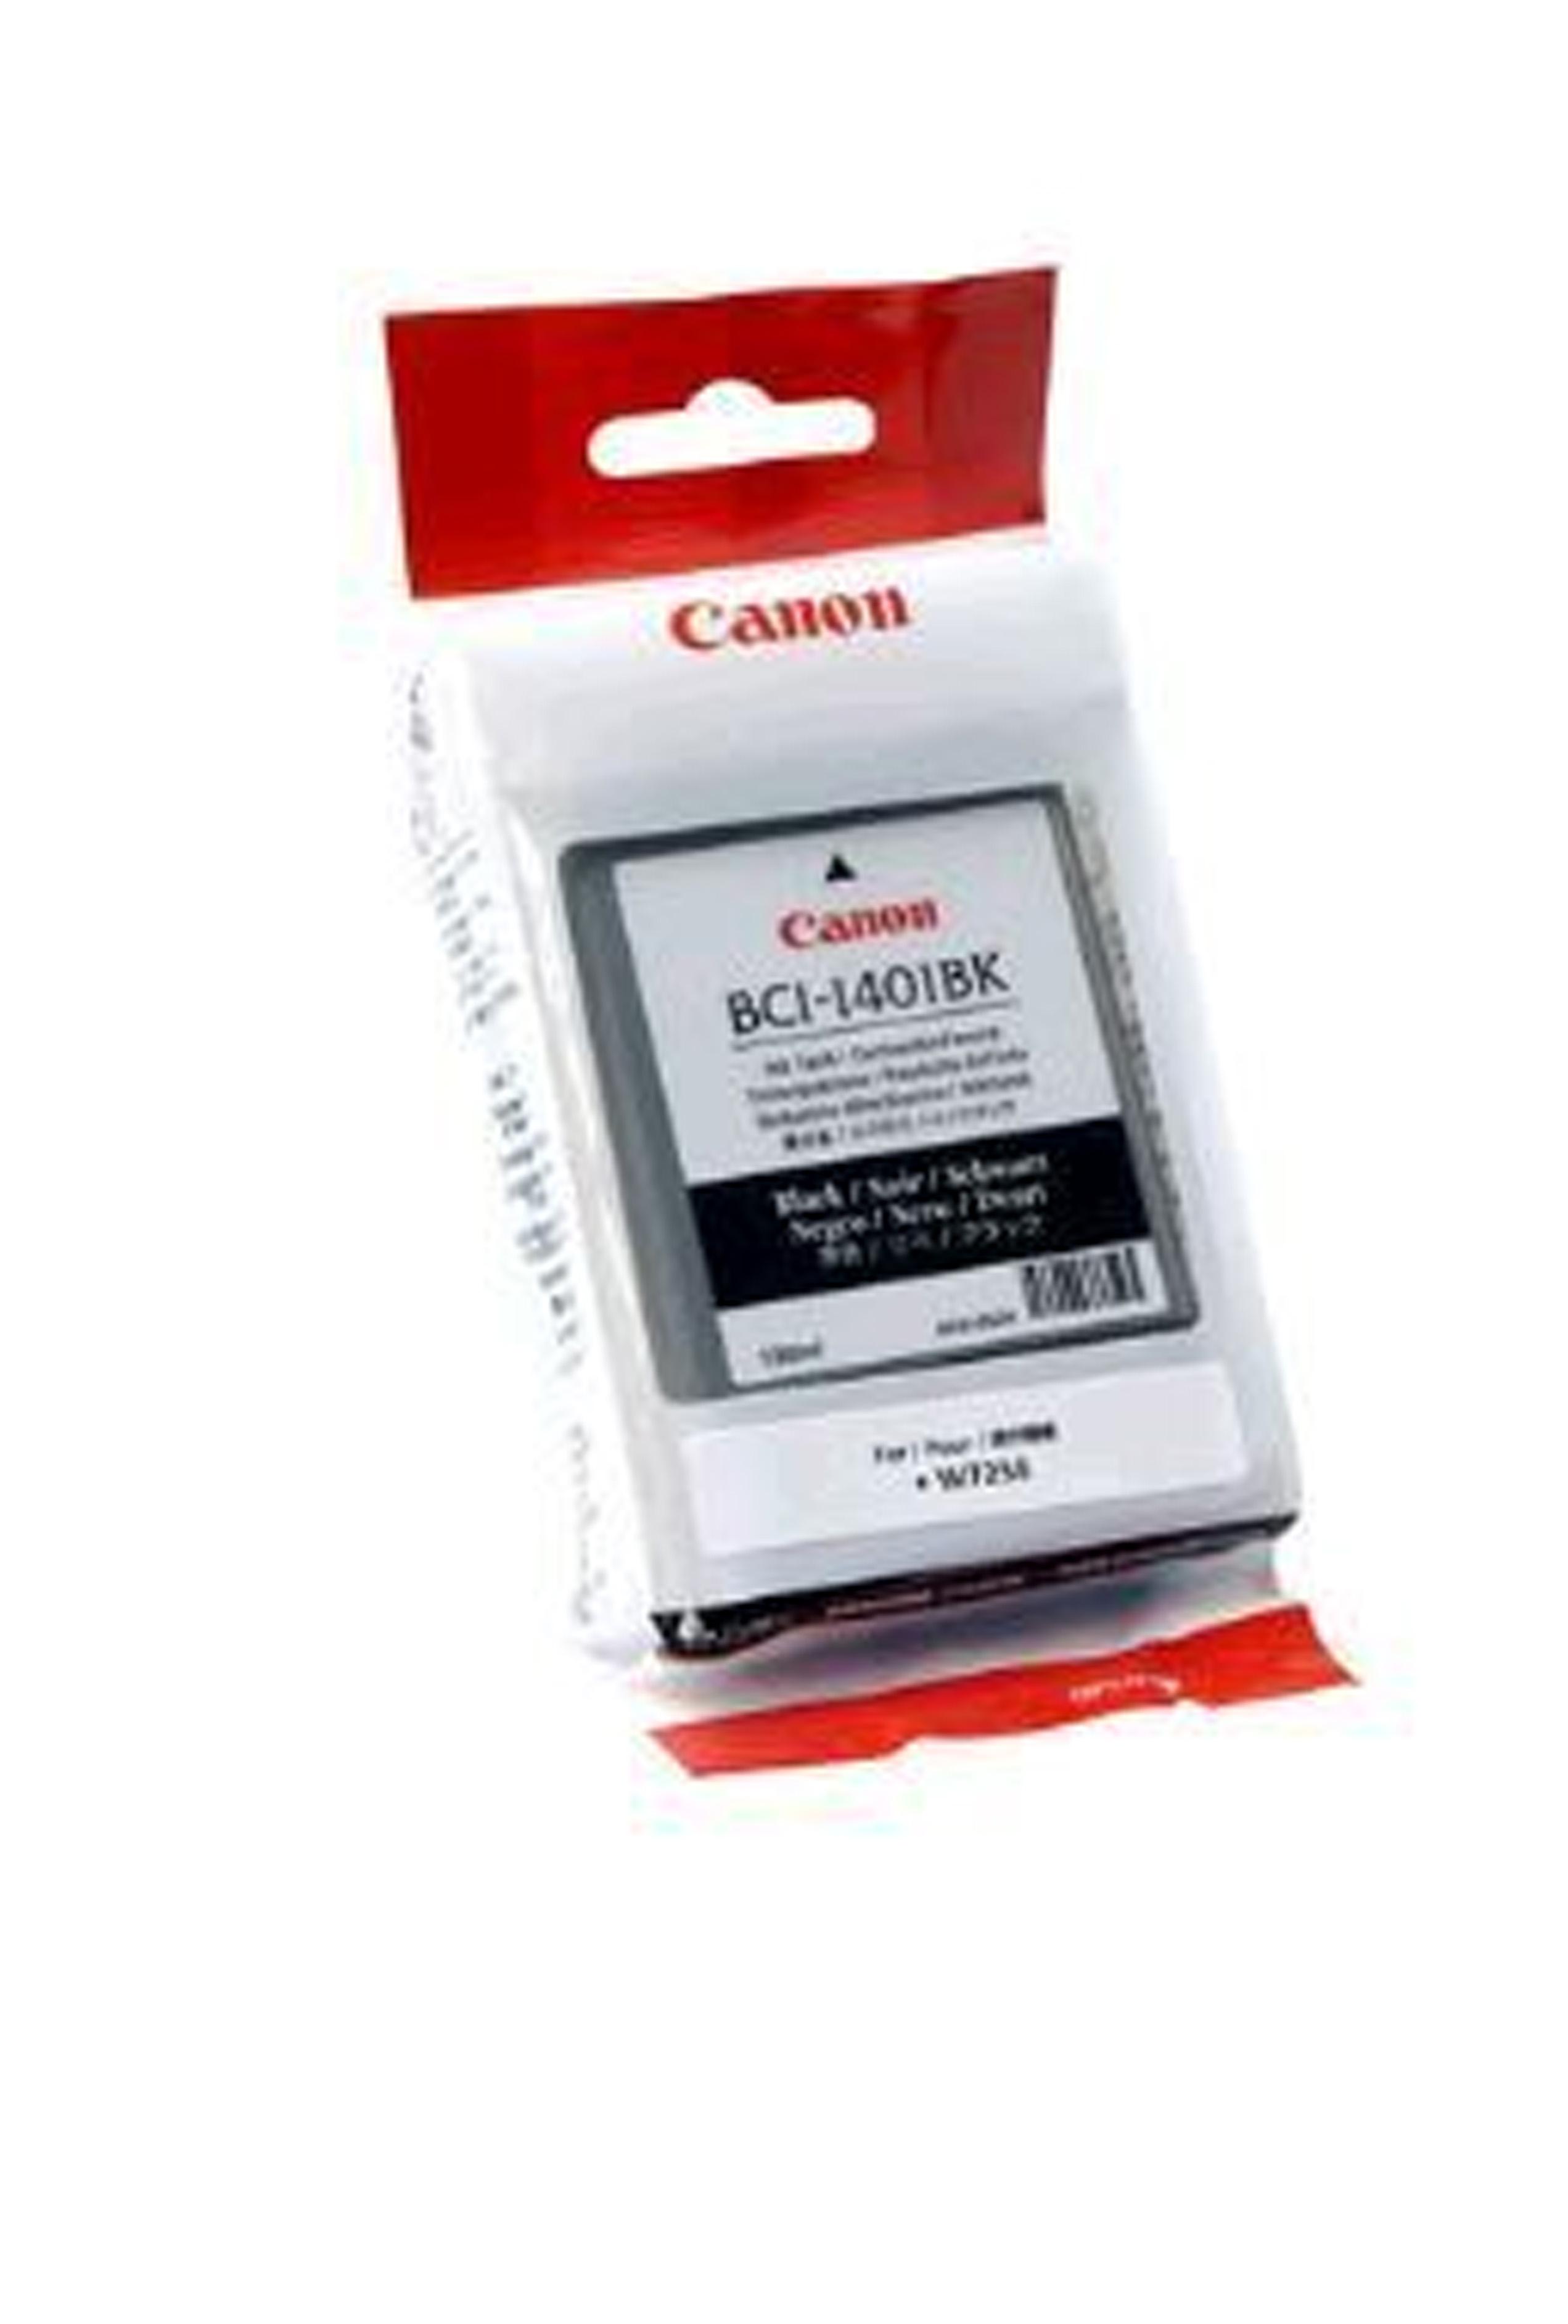 Canon BCI-1401BK - Black Ink Tank 130ml (7568A001AA)